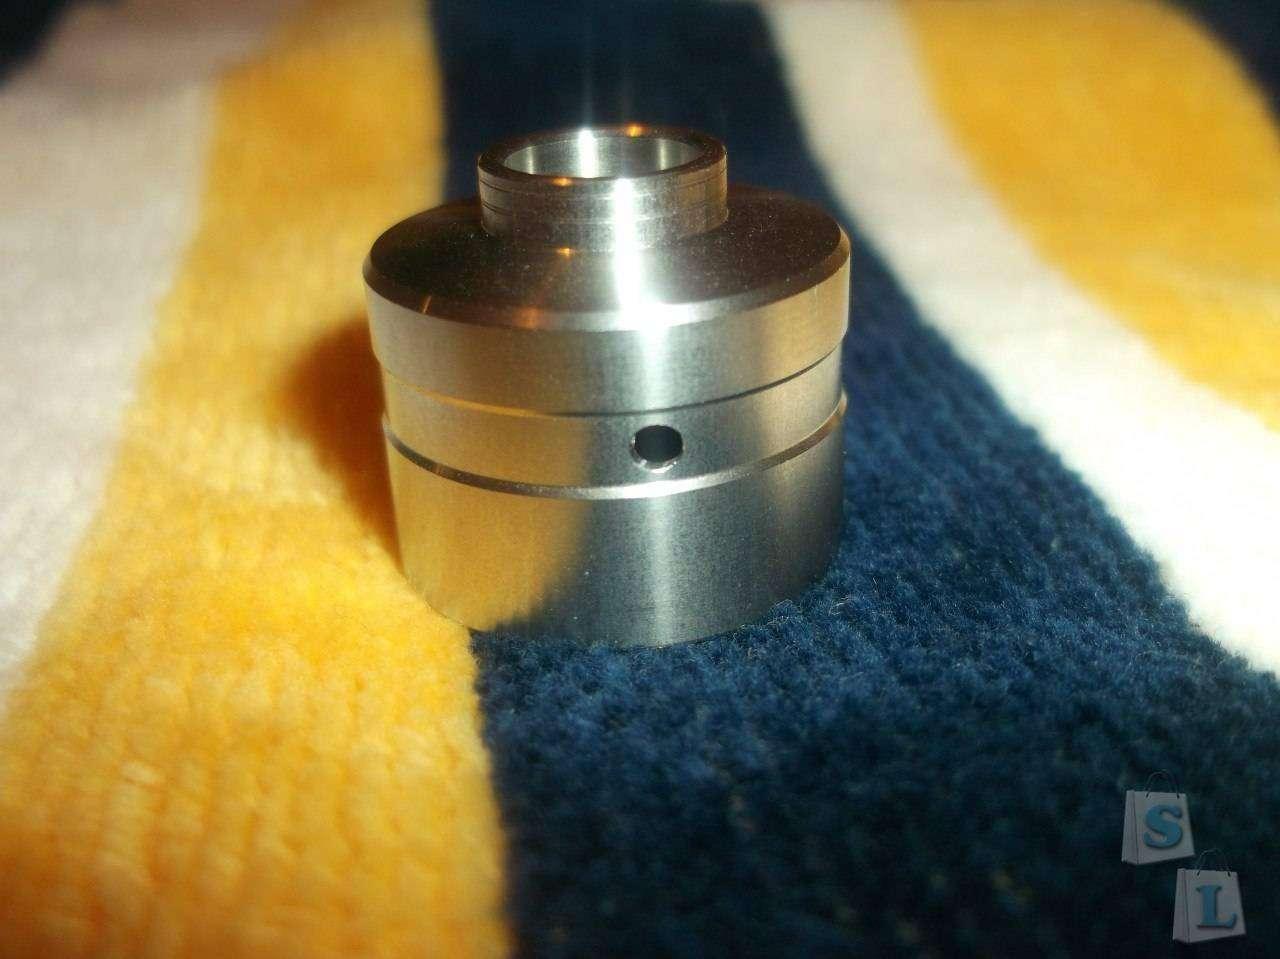 GearBest: K.Loud by Hotcig, маленький обслуживаемый атомайзер (клон).